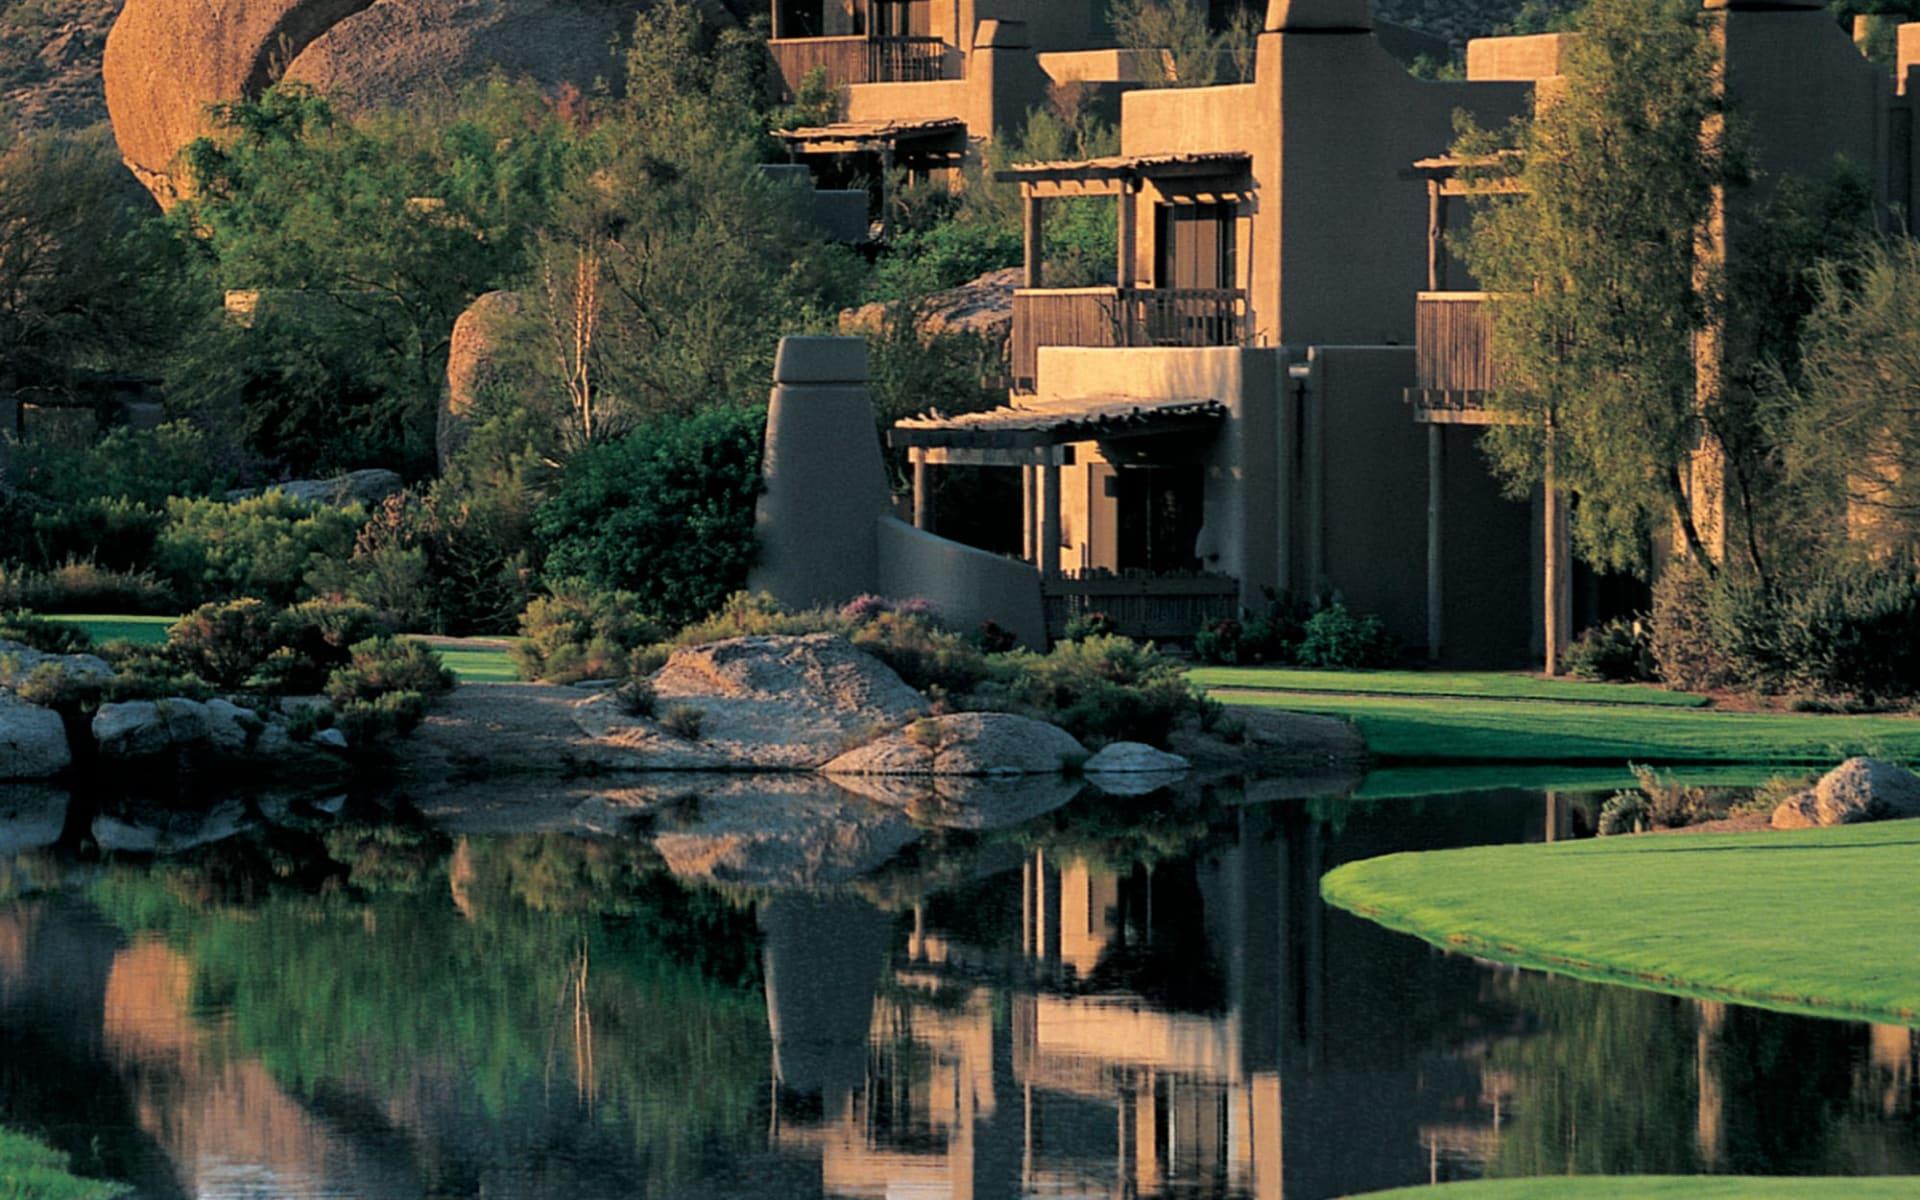 Boulders Resort & Spa in Scottsdale: Exterior_Boulders Resort & Spa_Aussenansicht_Bonotel